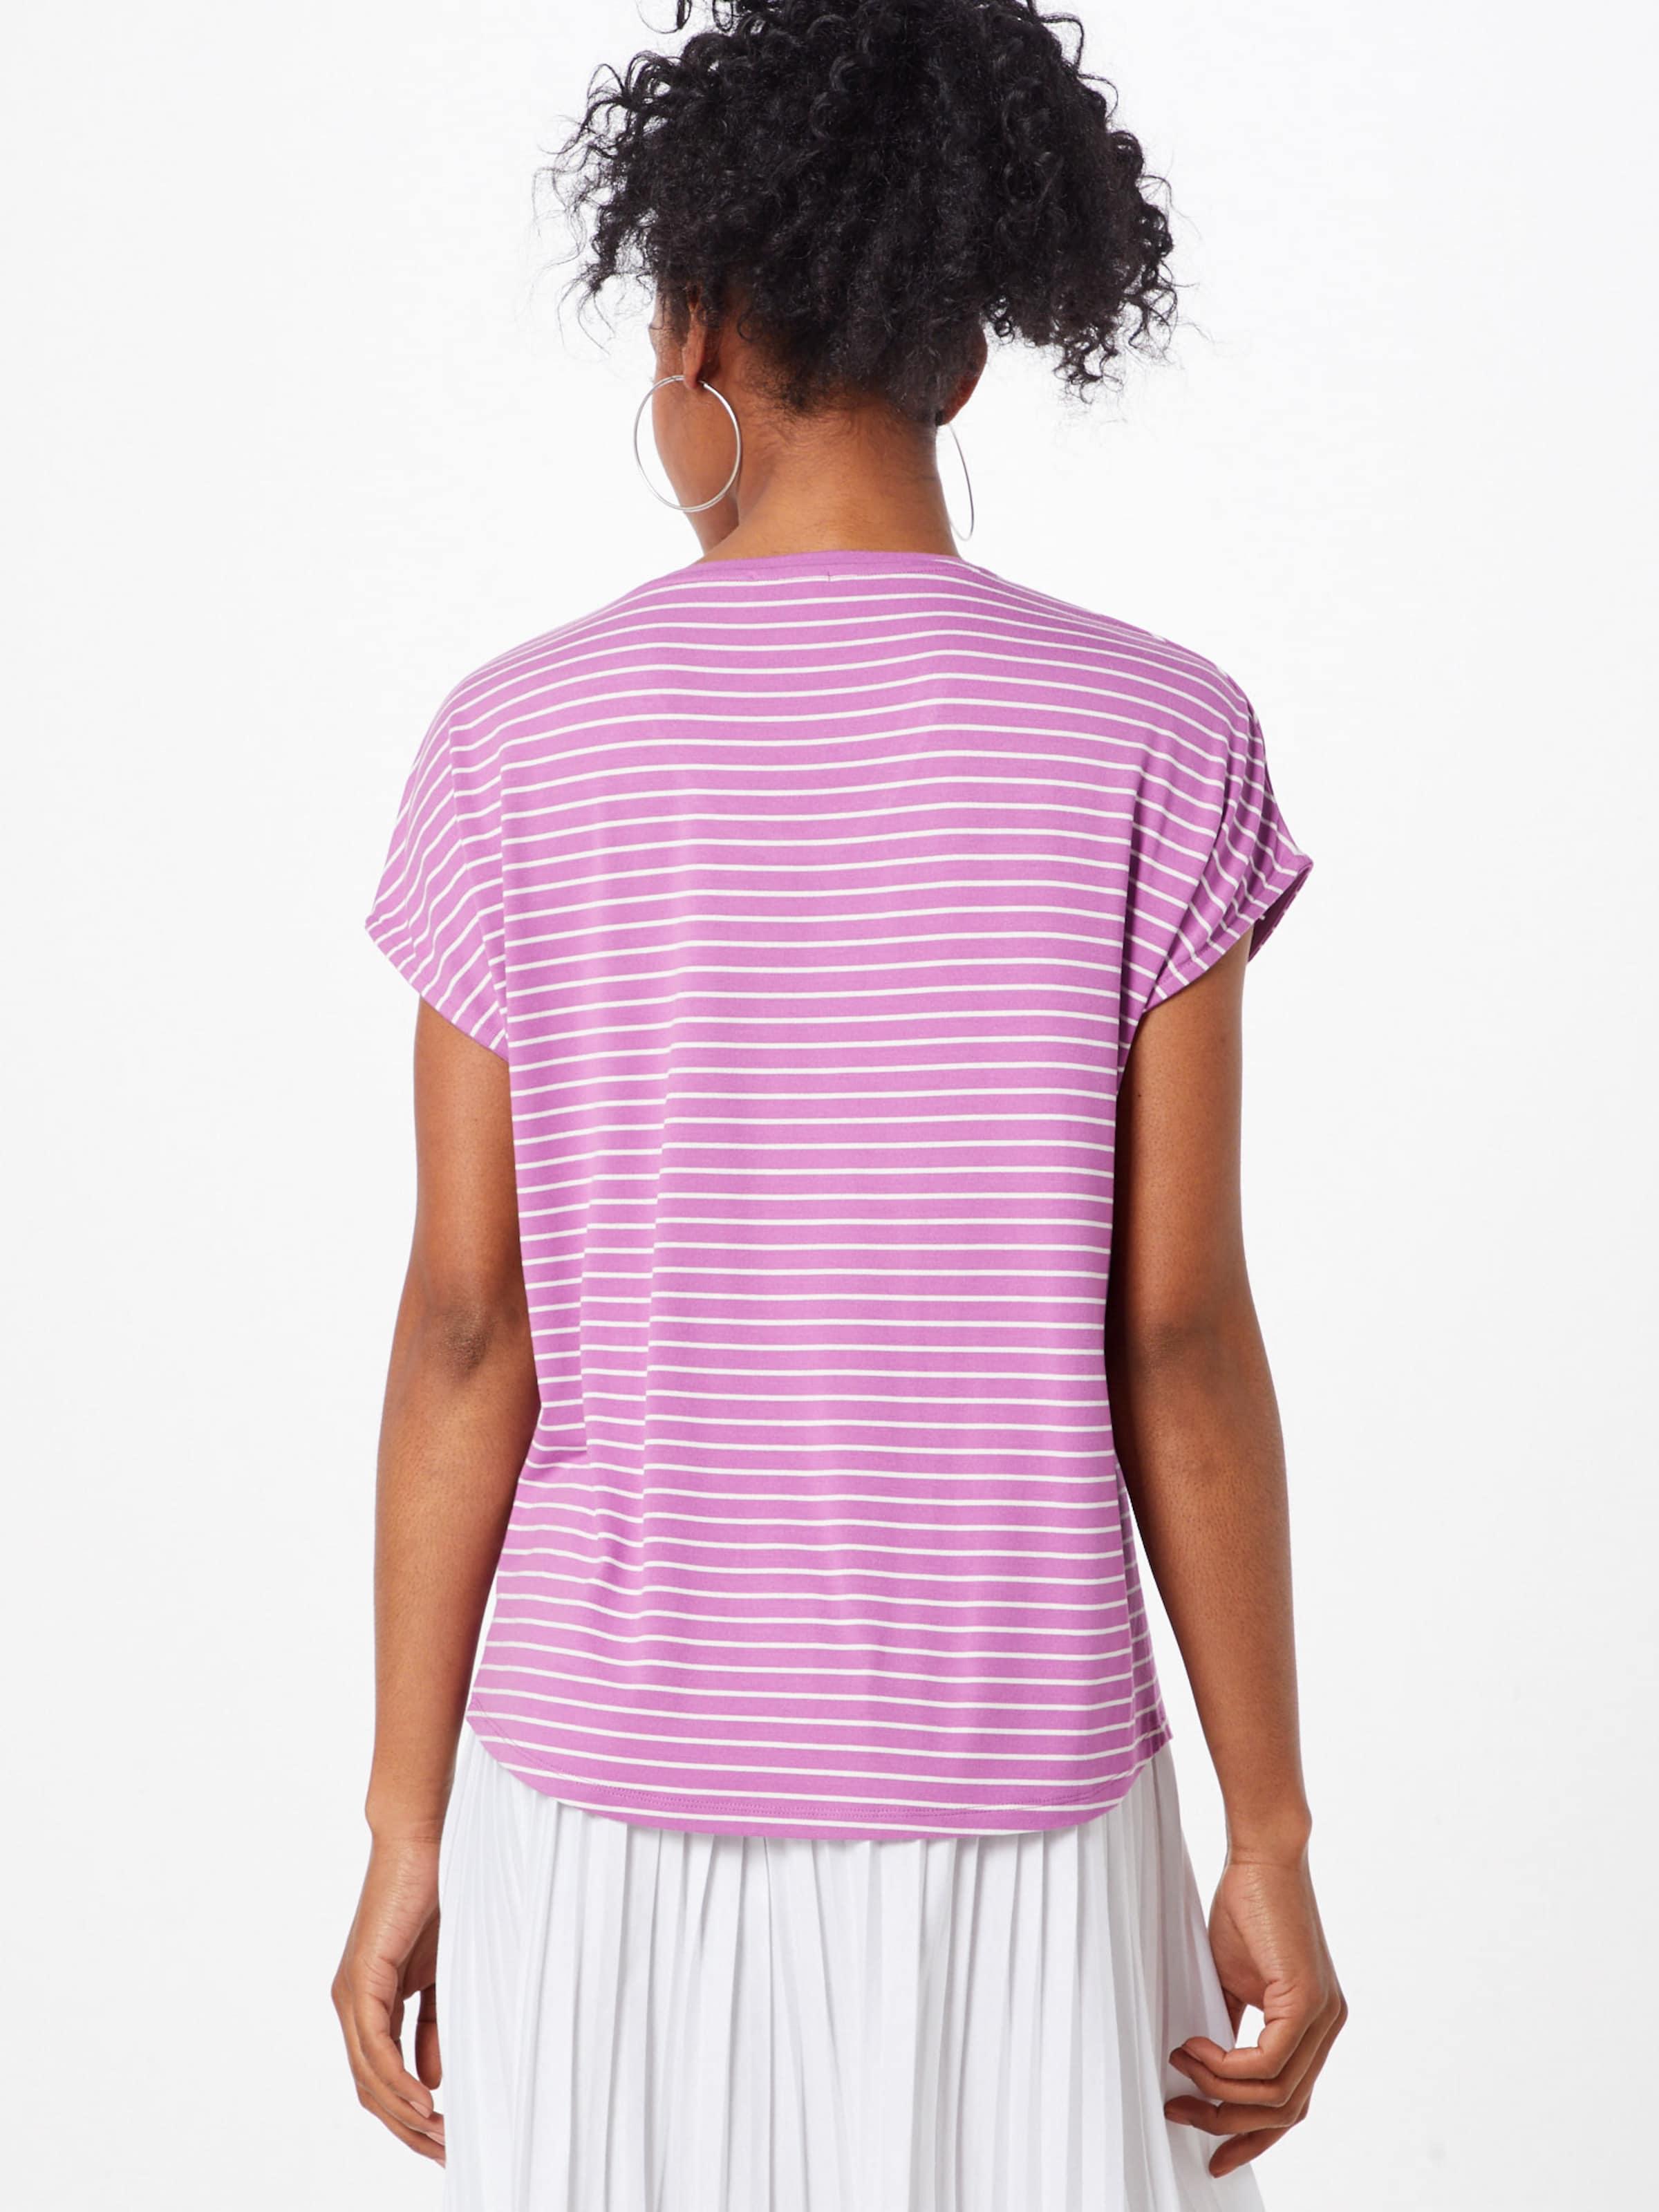 T En VioletBlanc draft shirt Re SMqpVUz